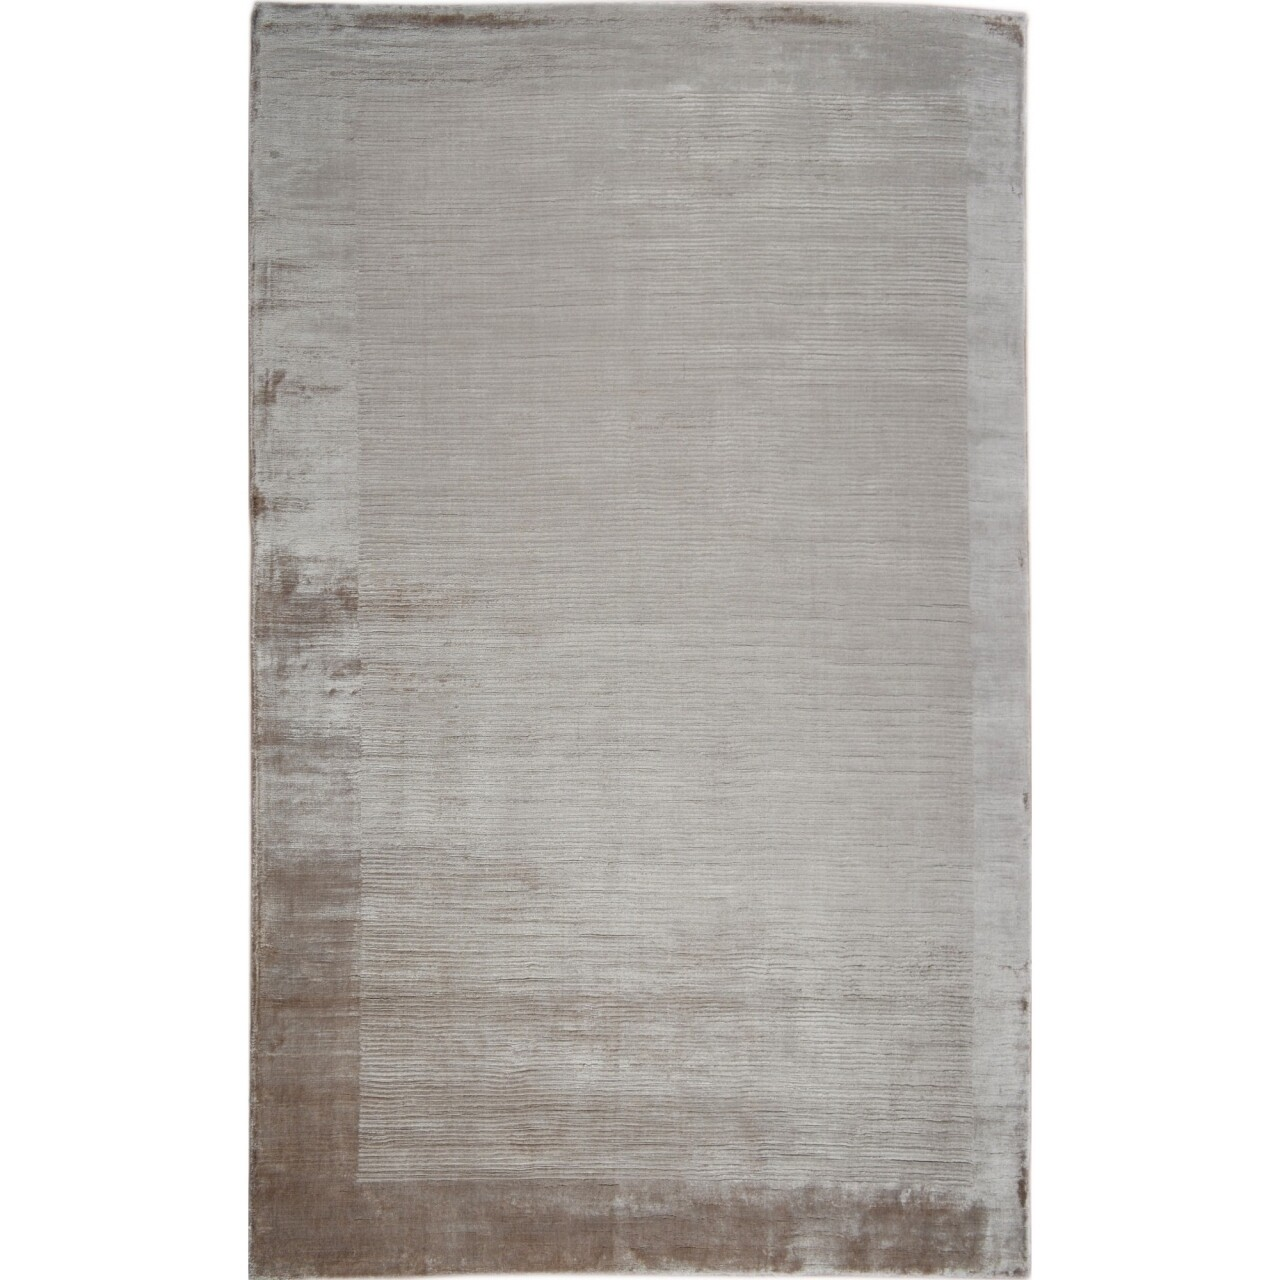 Covor rezistent Alya 3300 - Dark Mink, 120x180 cm